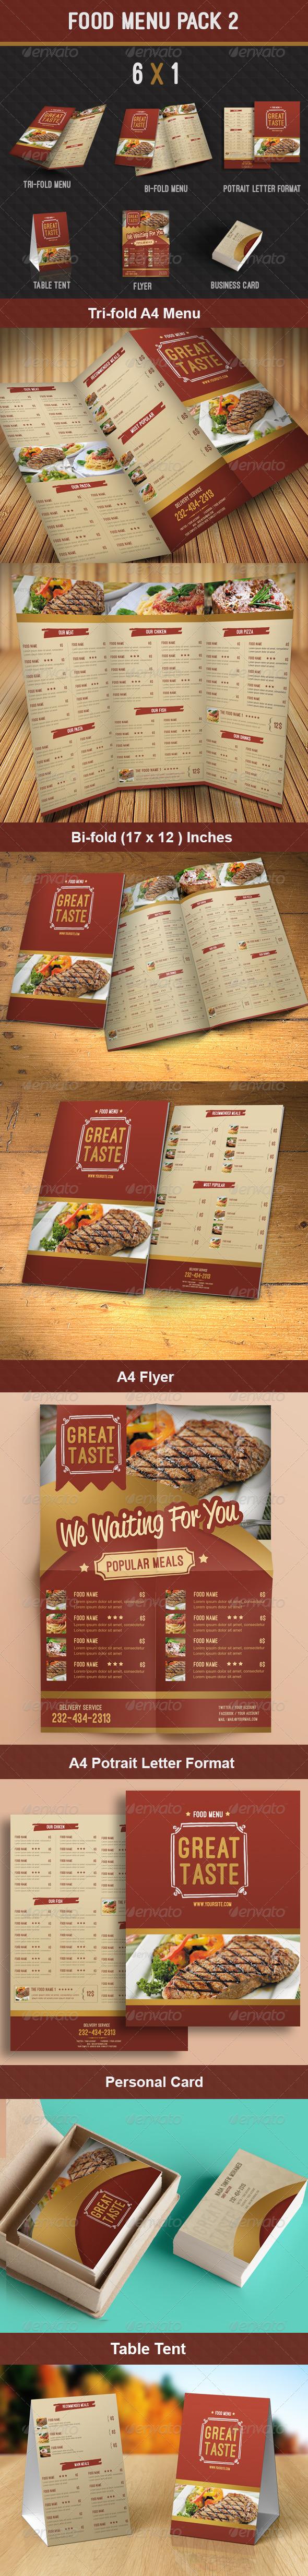 GraphicRiver Food Menu Pack 2 8353801